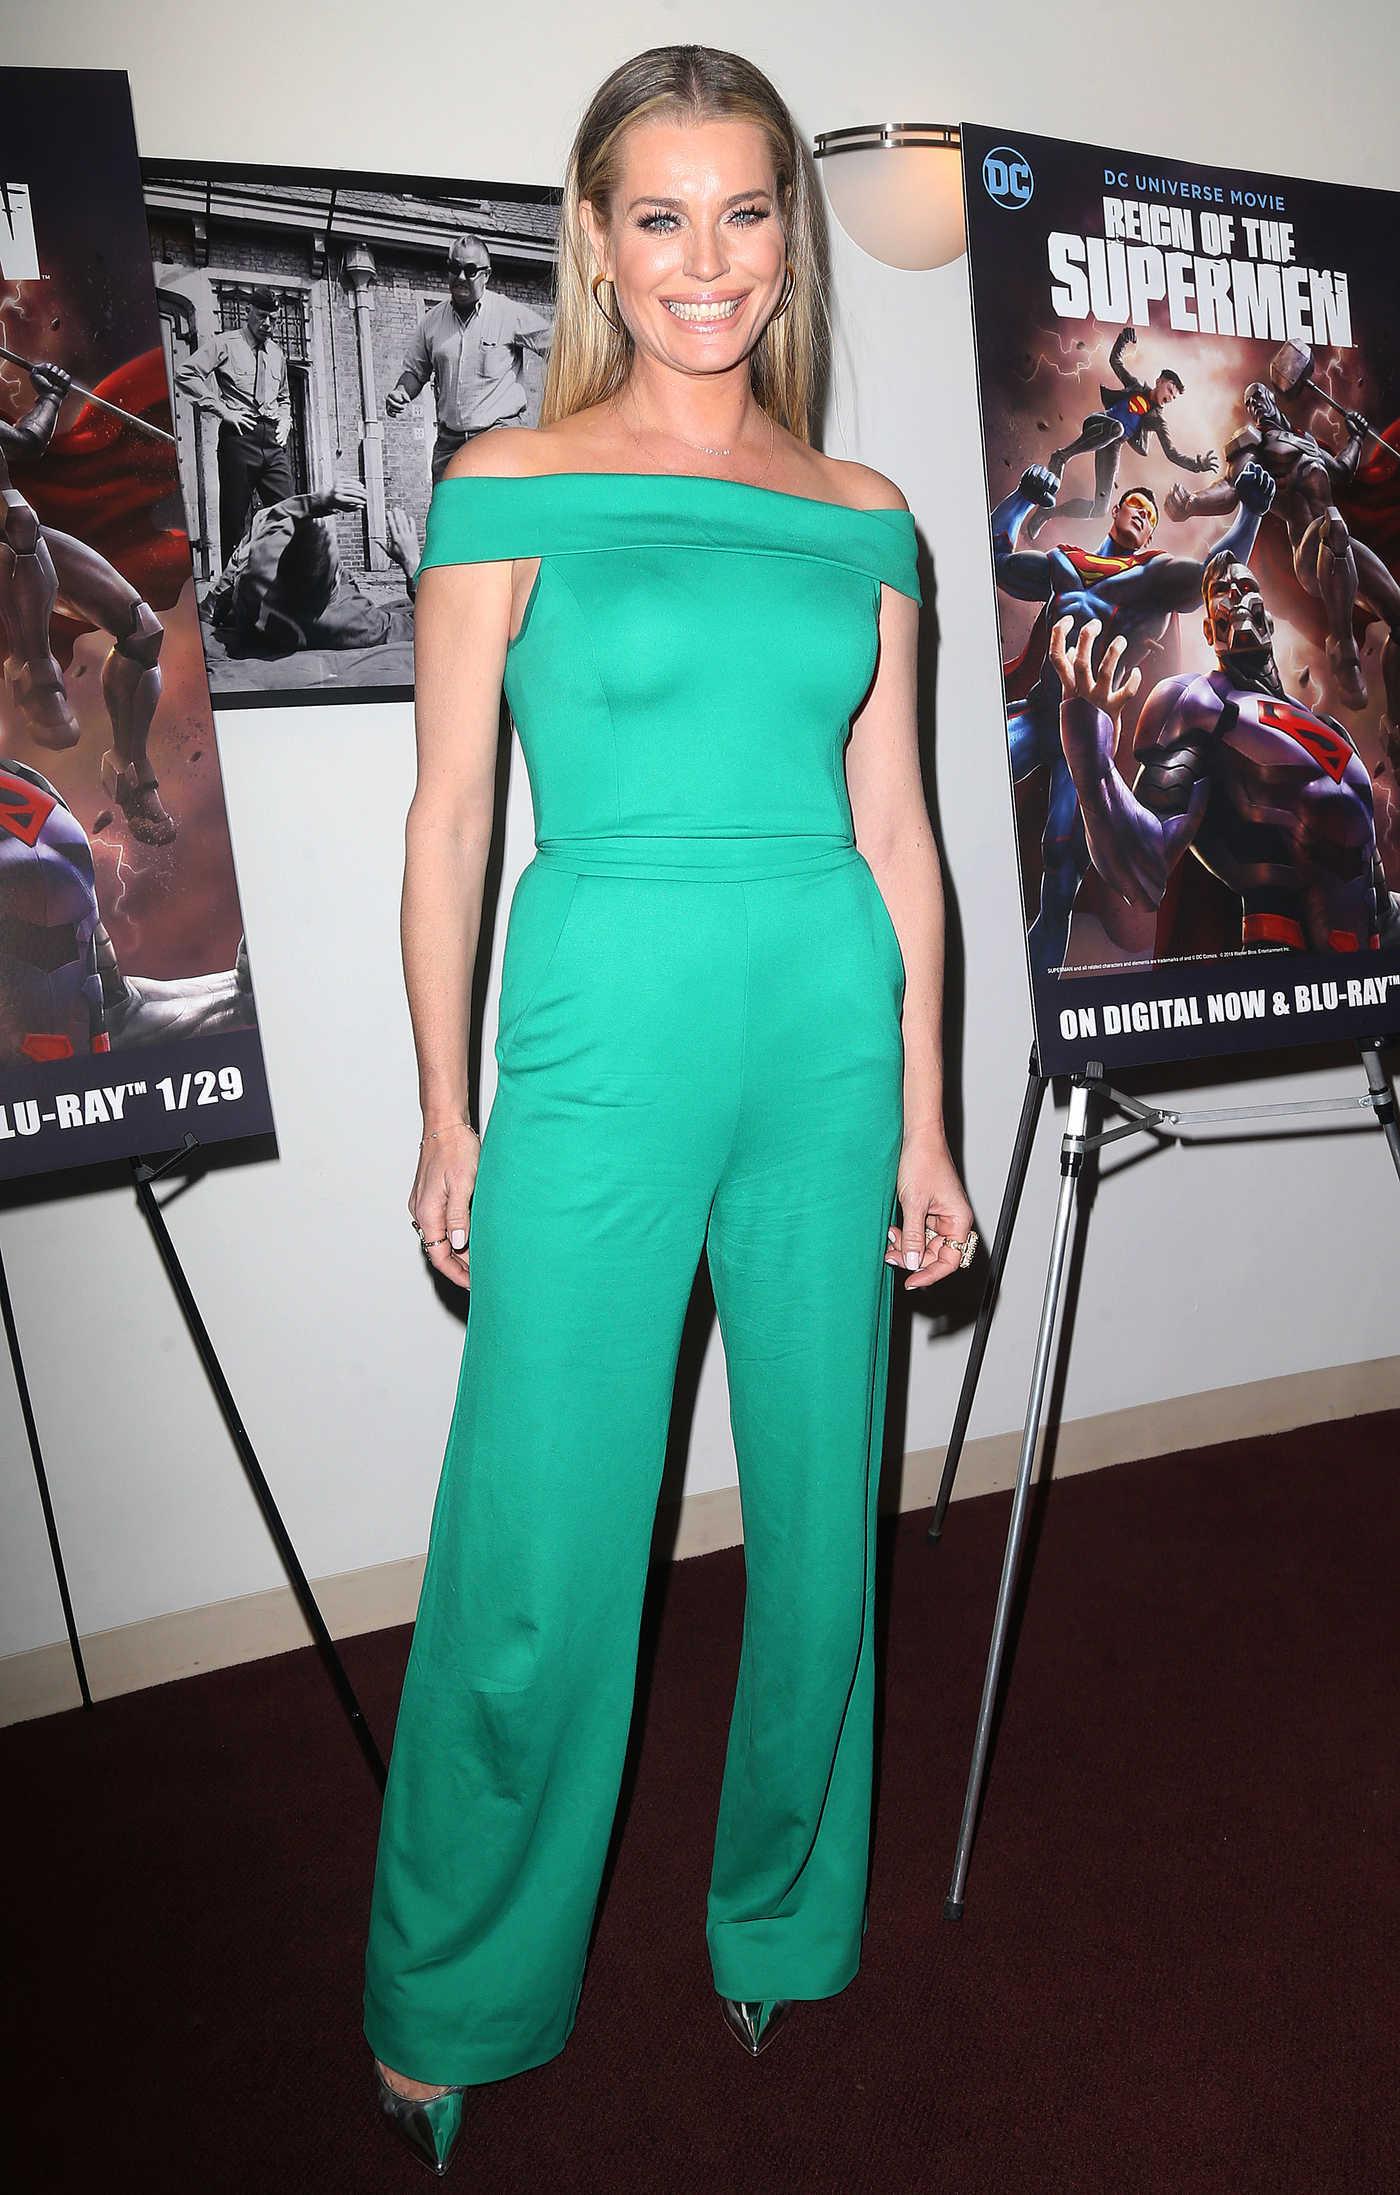 Rebecca Romijn Attends Reign of the Supermen Premiere in New York 01/28/2019